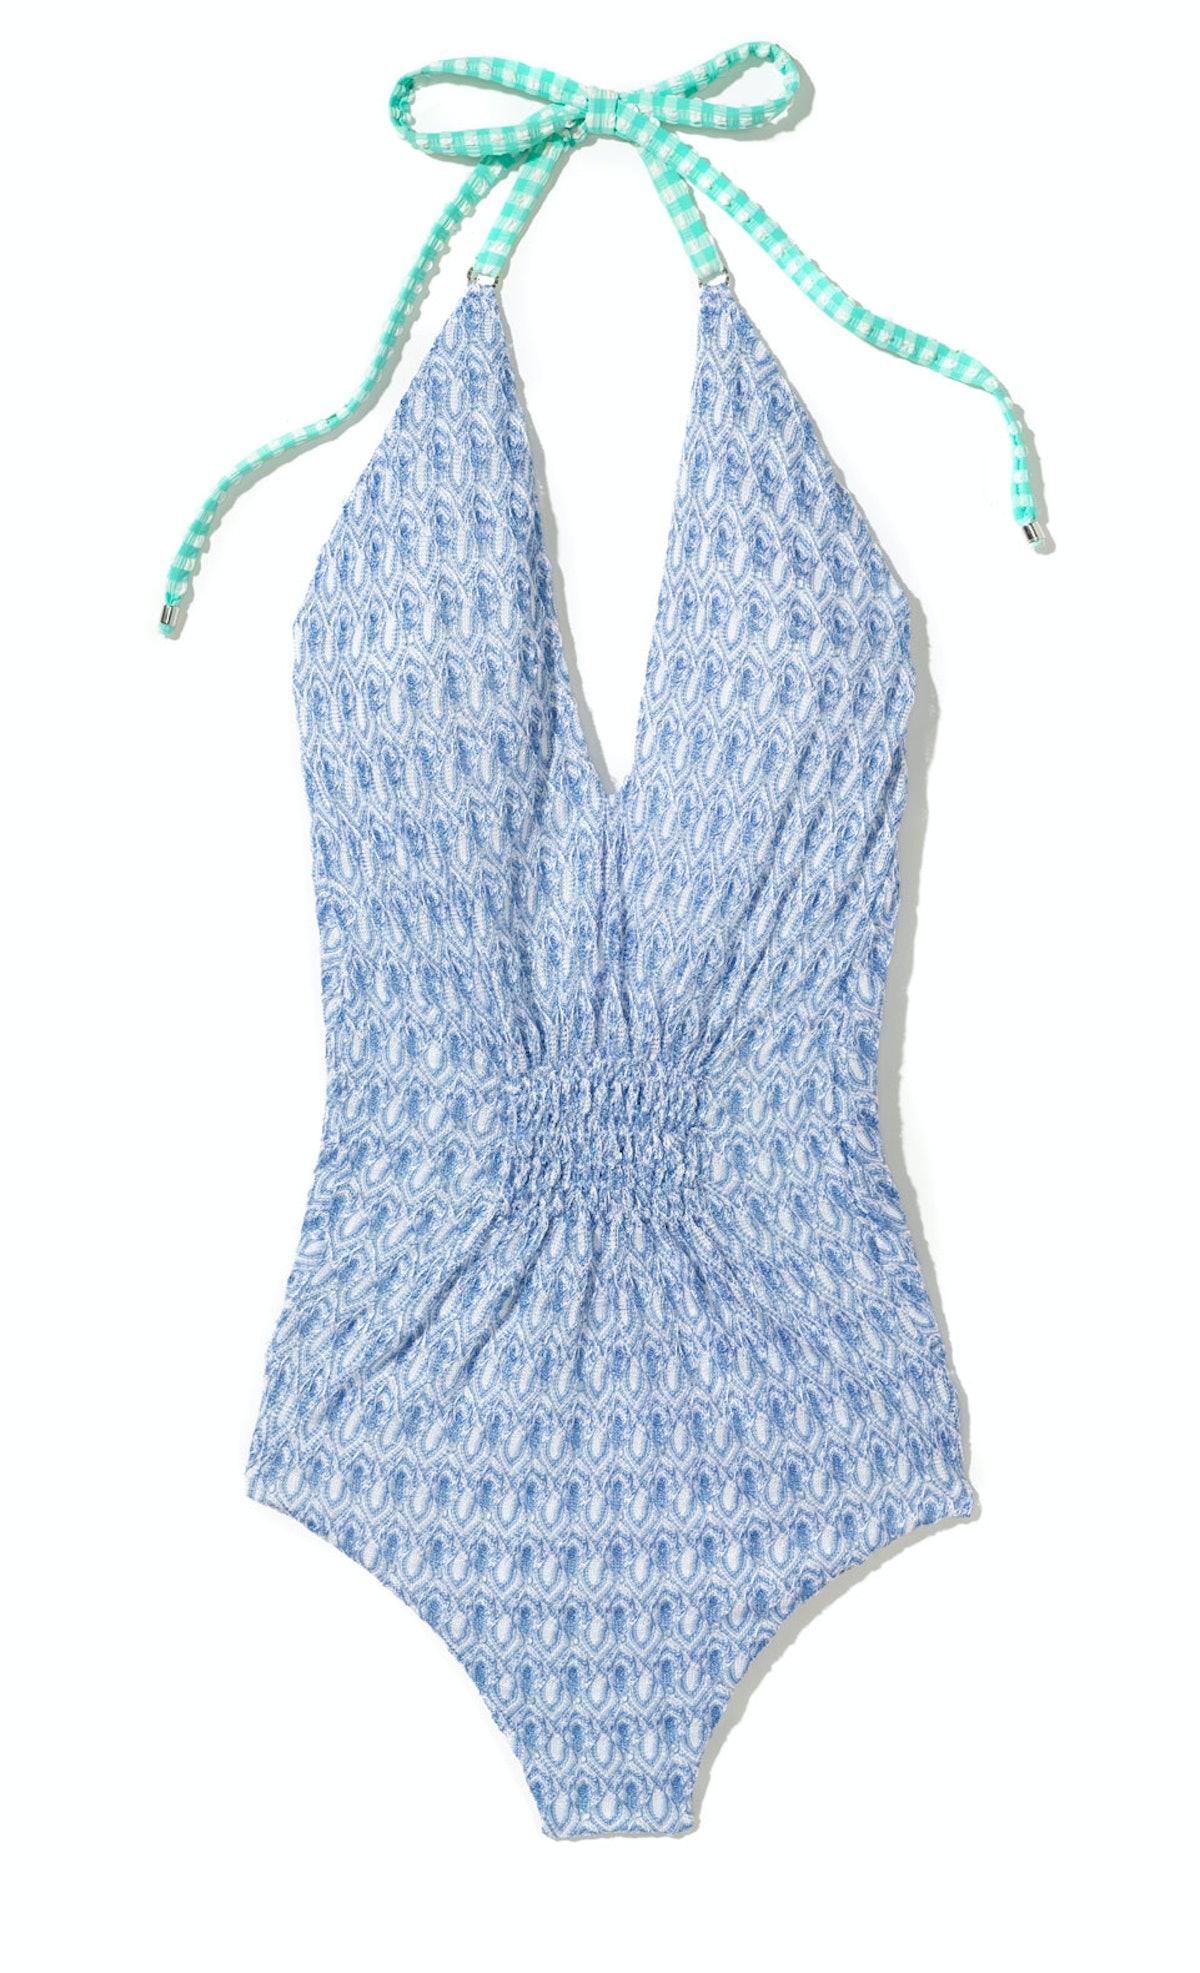 Missoni swimsuit, $580, [barneys.com](http://rstyle.me/n/djviq3w3n).